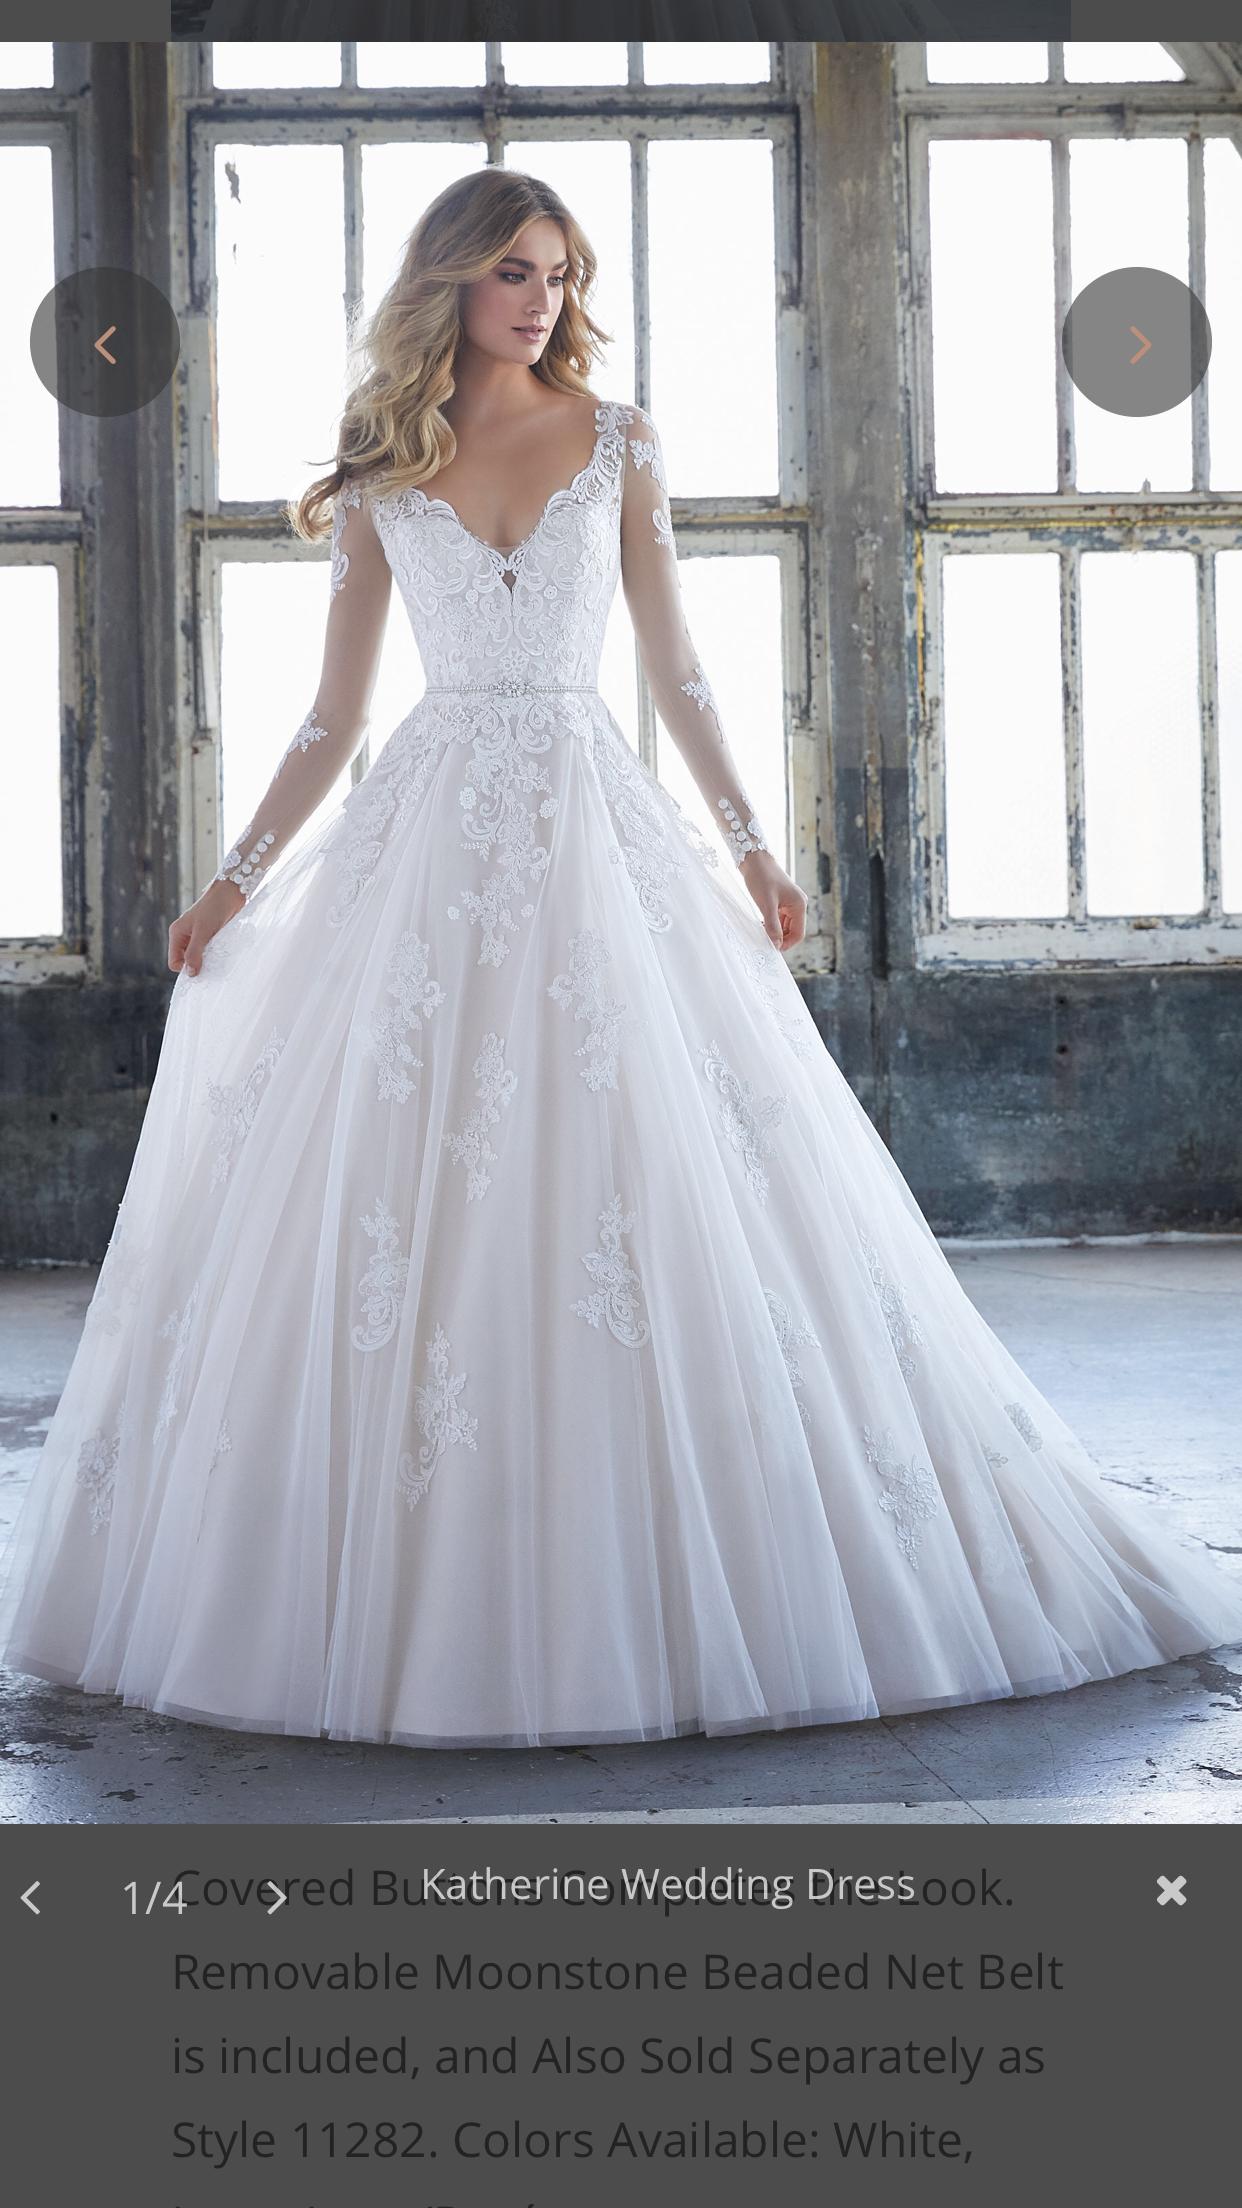 Pin by erika mora on wedding dresses pinterest wedding dress and